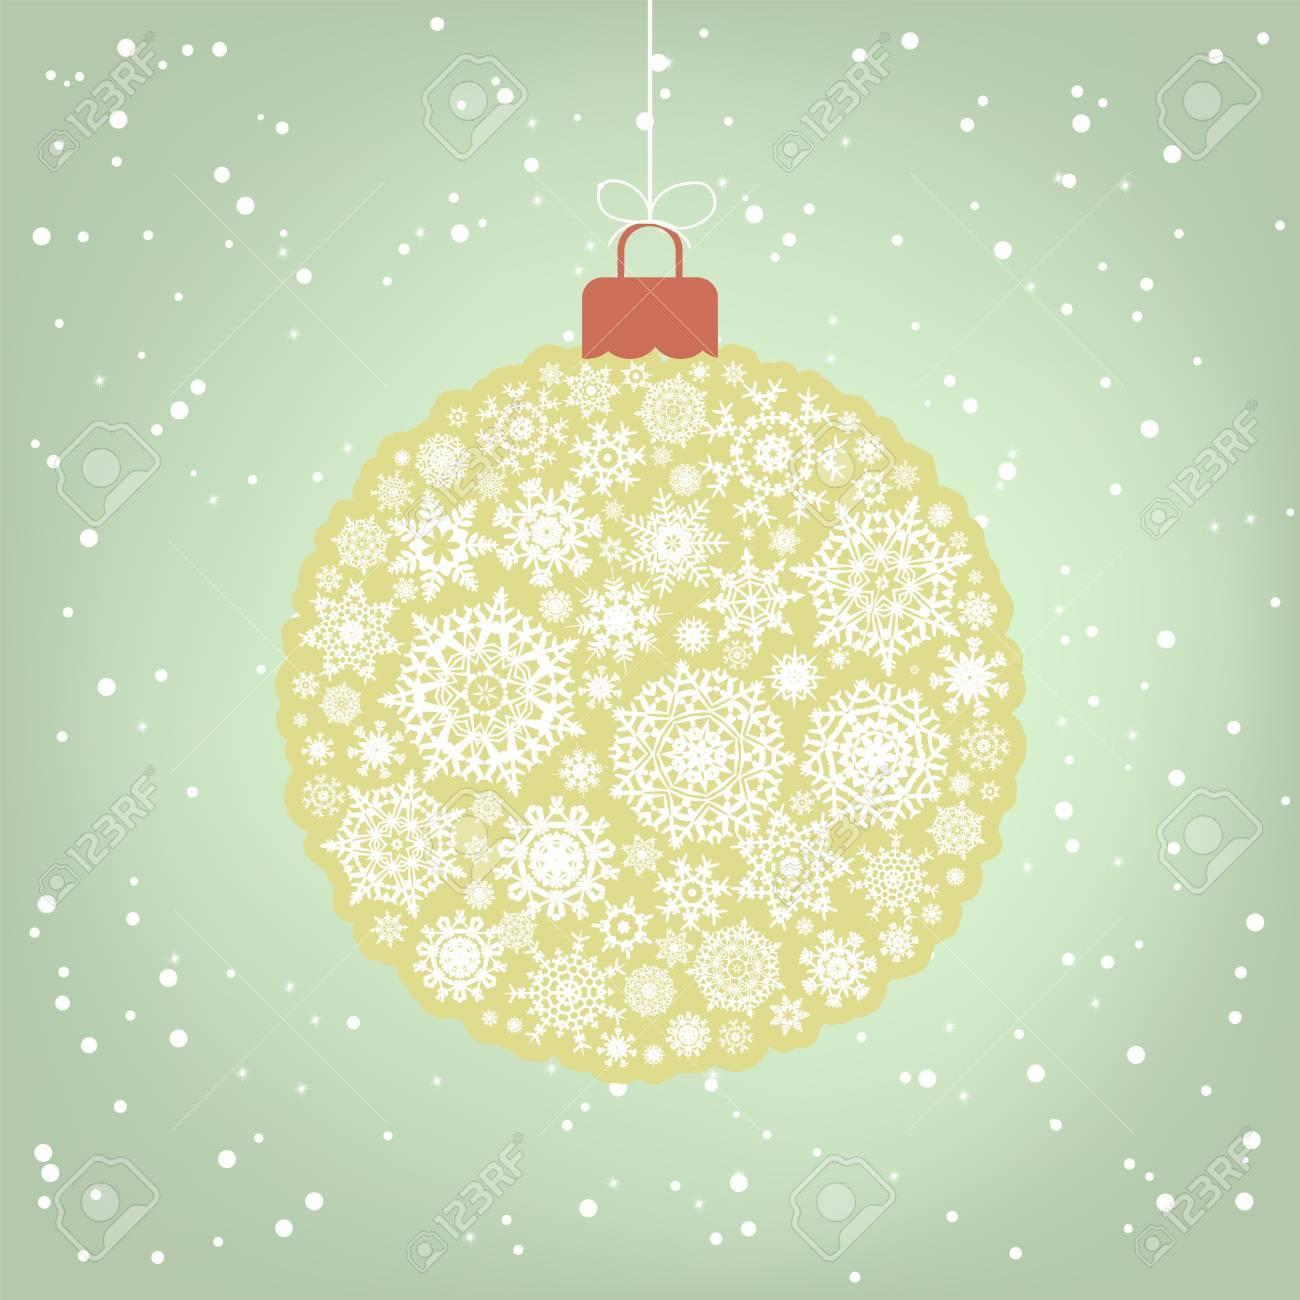 Retro template - Beautiful Christmas ball illustration. Stock Vector - 8315285